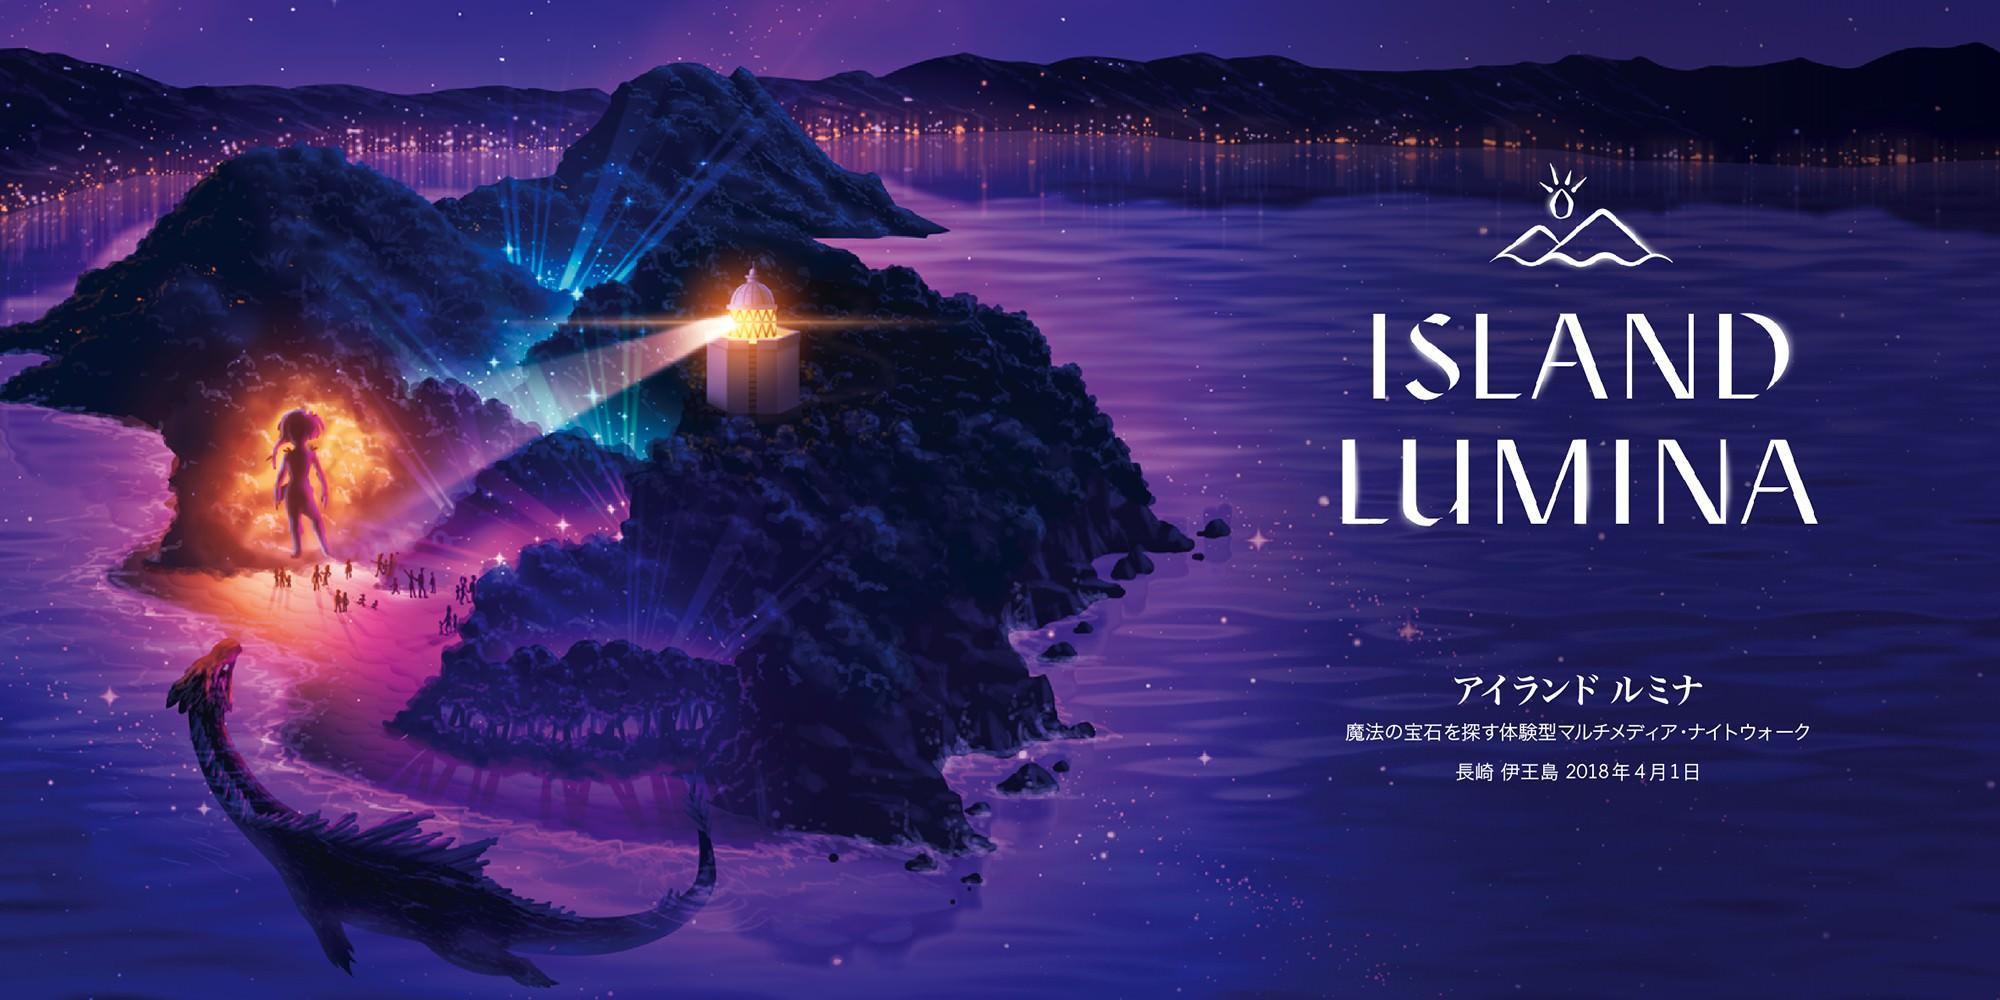 entertainment-island-lumina-00-pc